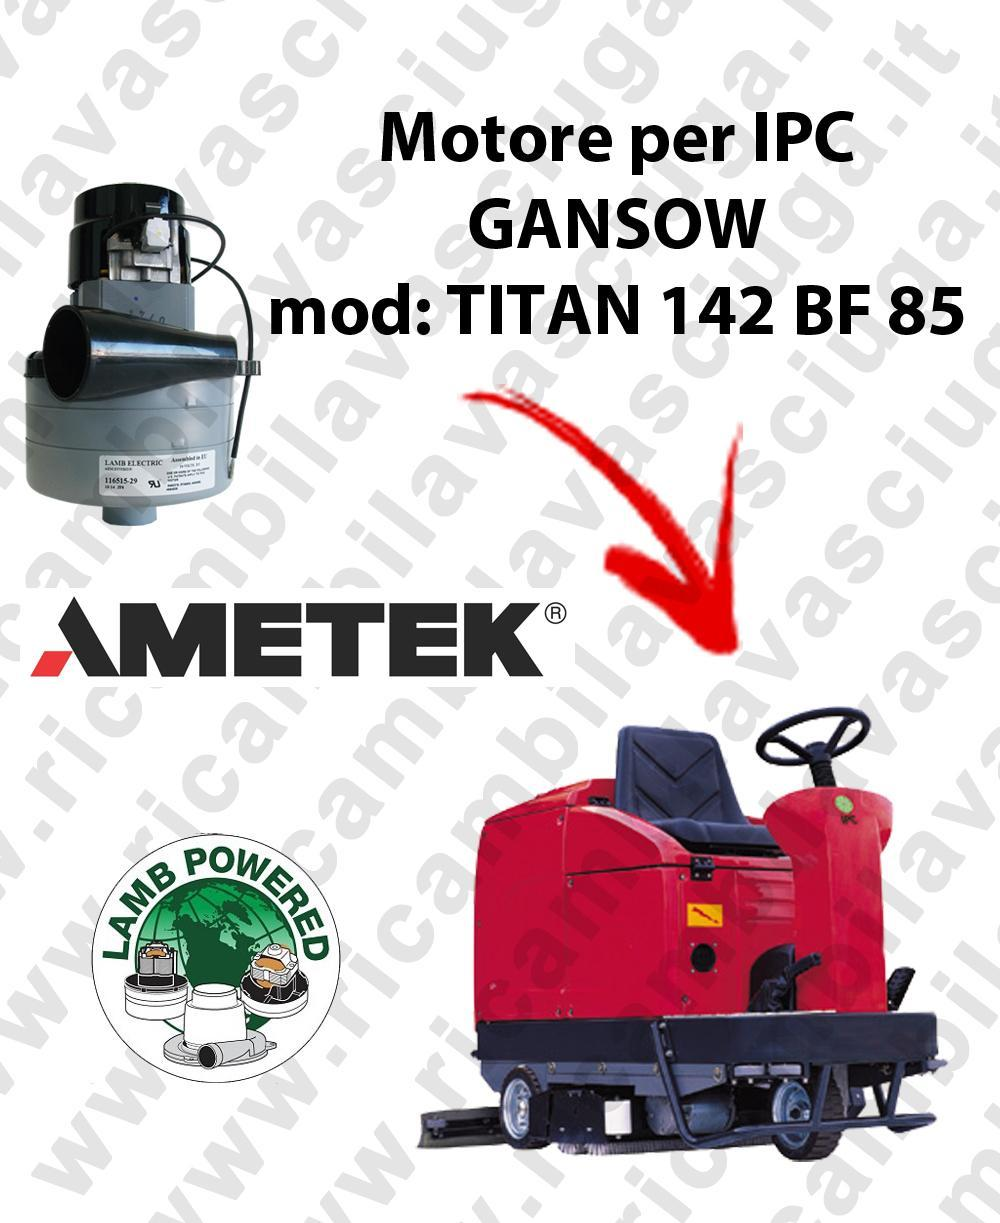 TITAN 142 BF 85 LAMB AMETEK vacuum motor for scrubber dryer IPC GANSOW